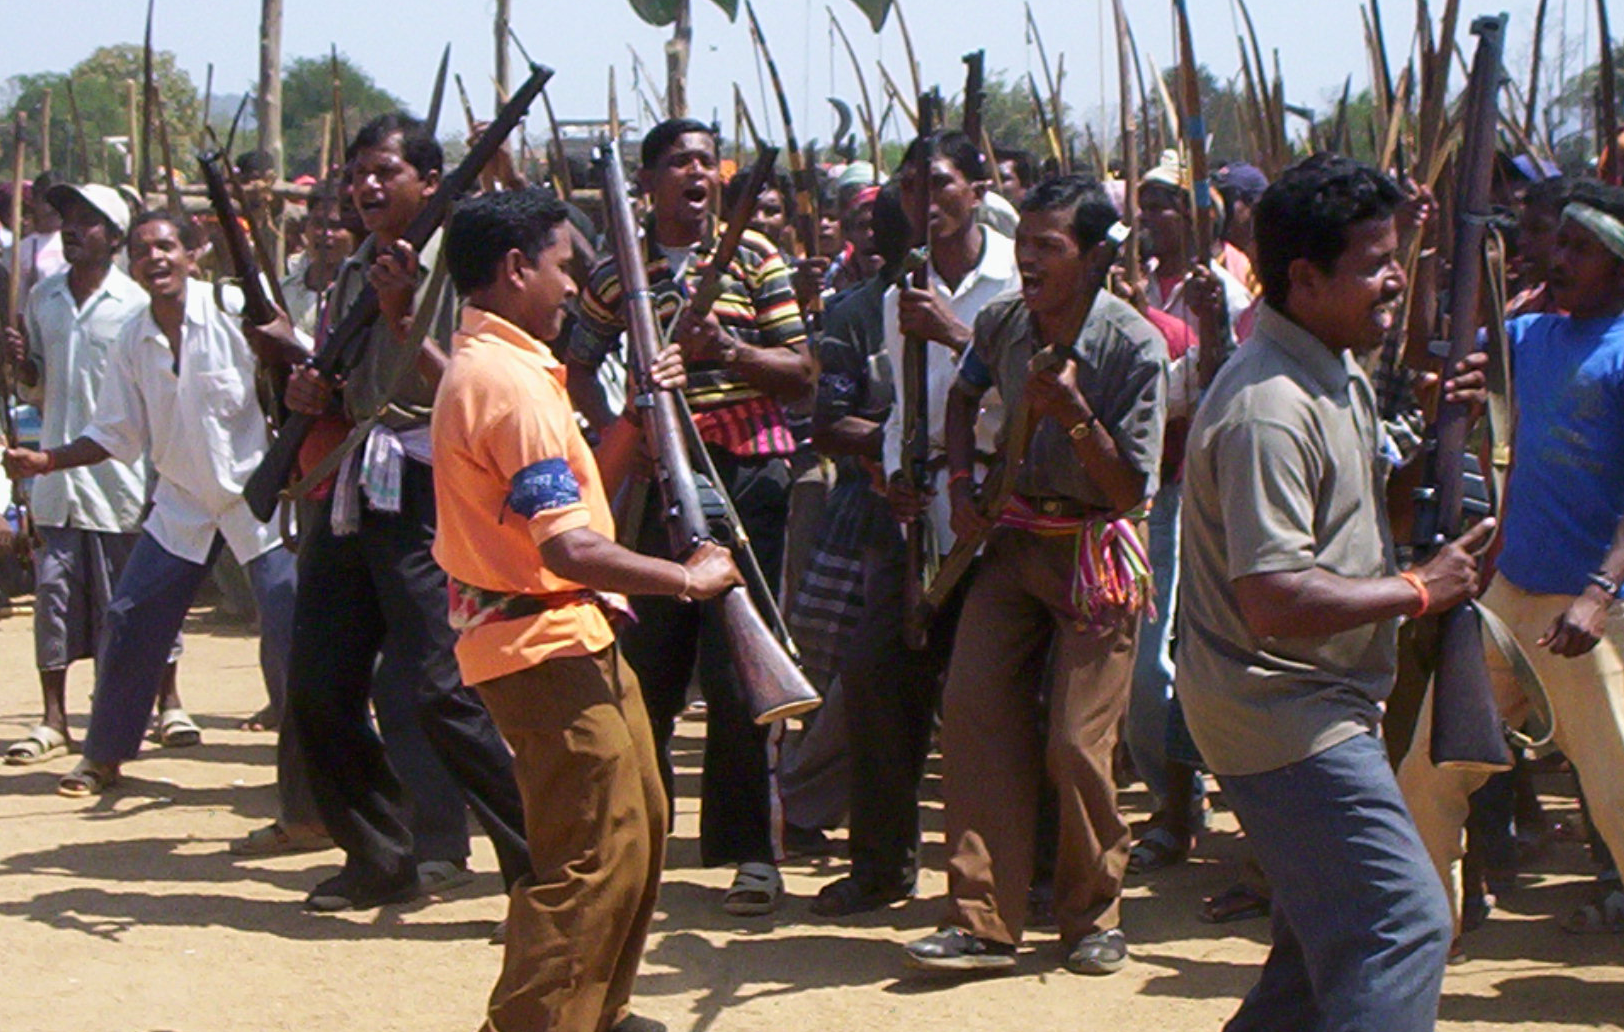 The first Salwa Judum rally in Konta, Chhattisgarh. Credit: Special arrangement